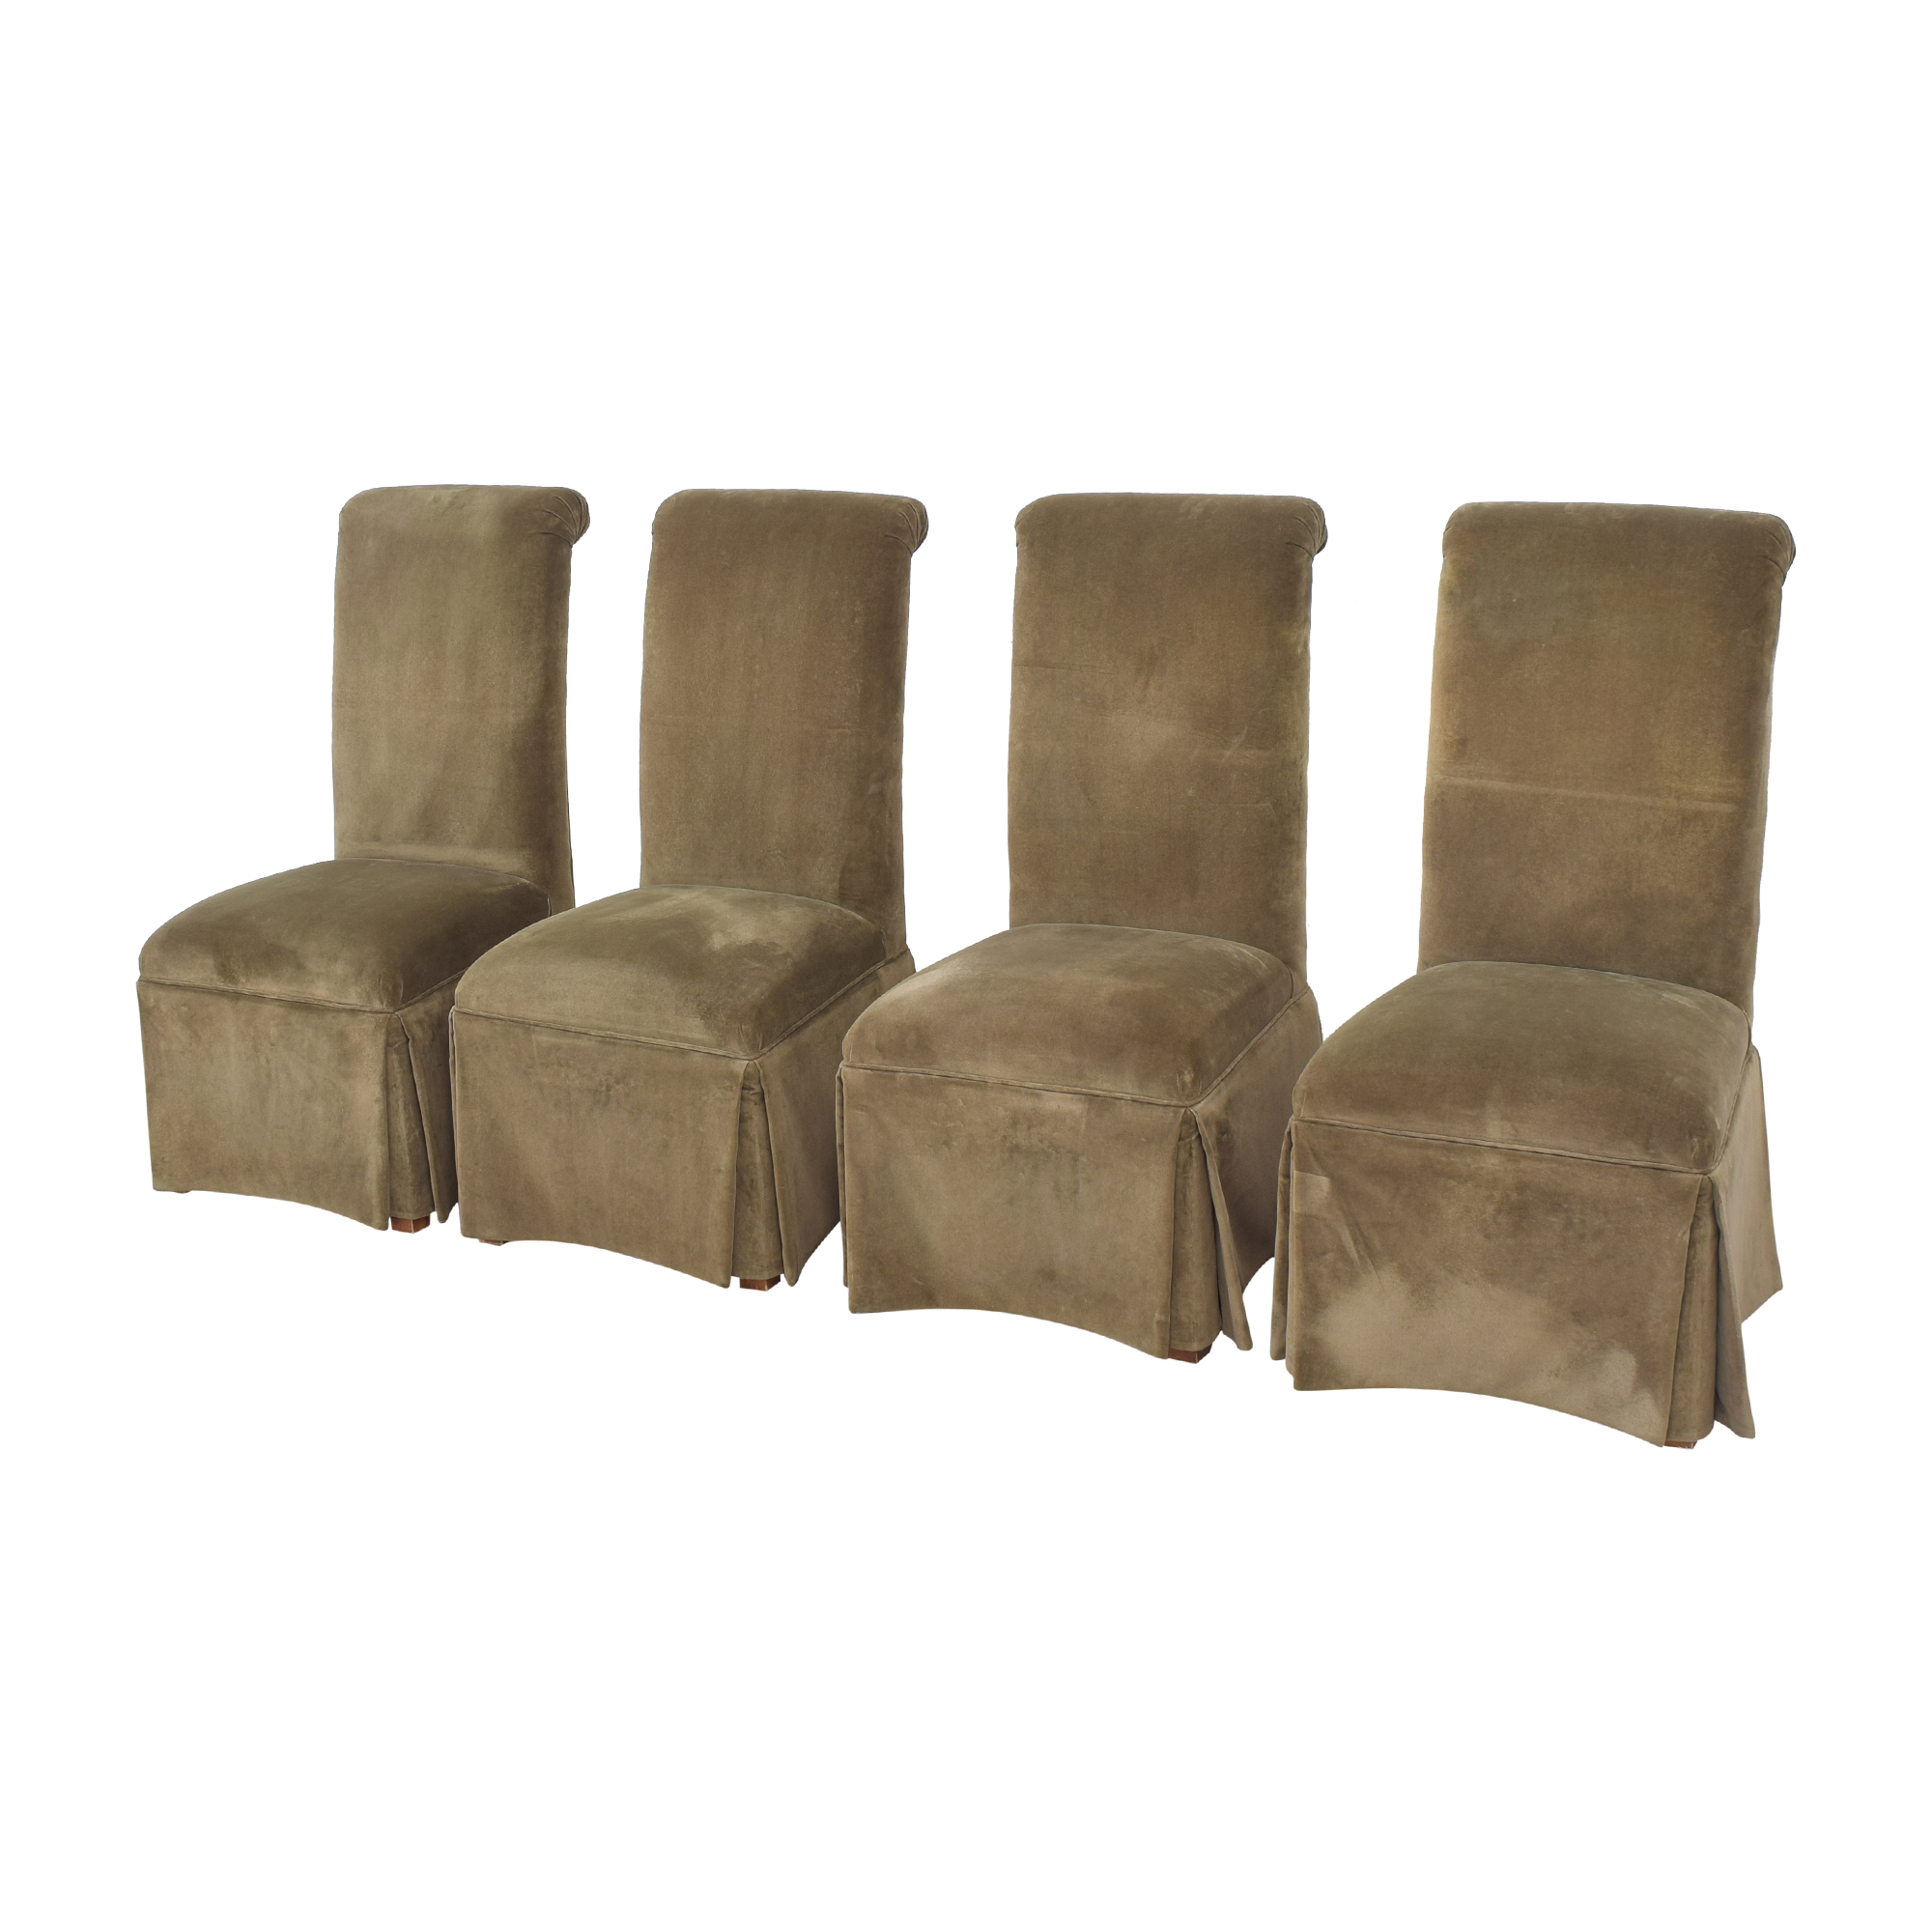 Domain Domain Skirted Dining Chairs nj